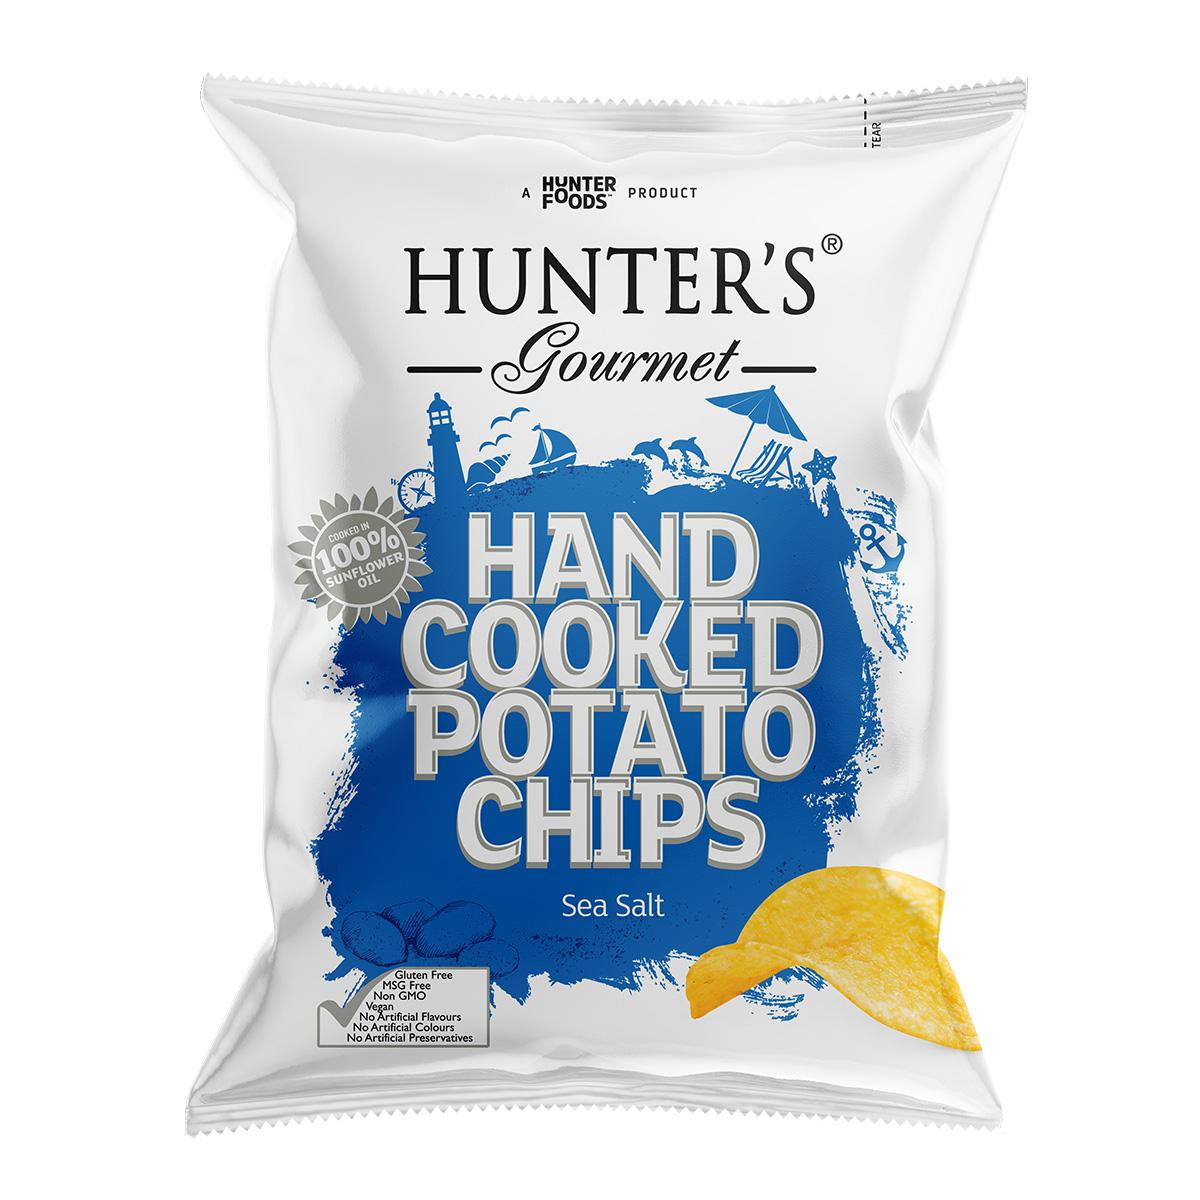 Hunter's Gourmet Hand Cooked Potato Chips – Sea Salt & Cider Vinegar (125gm)